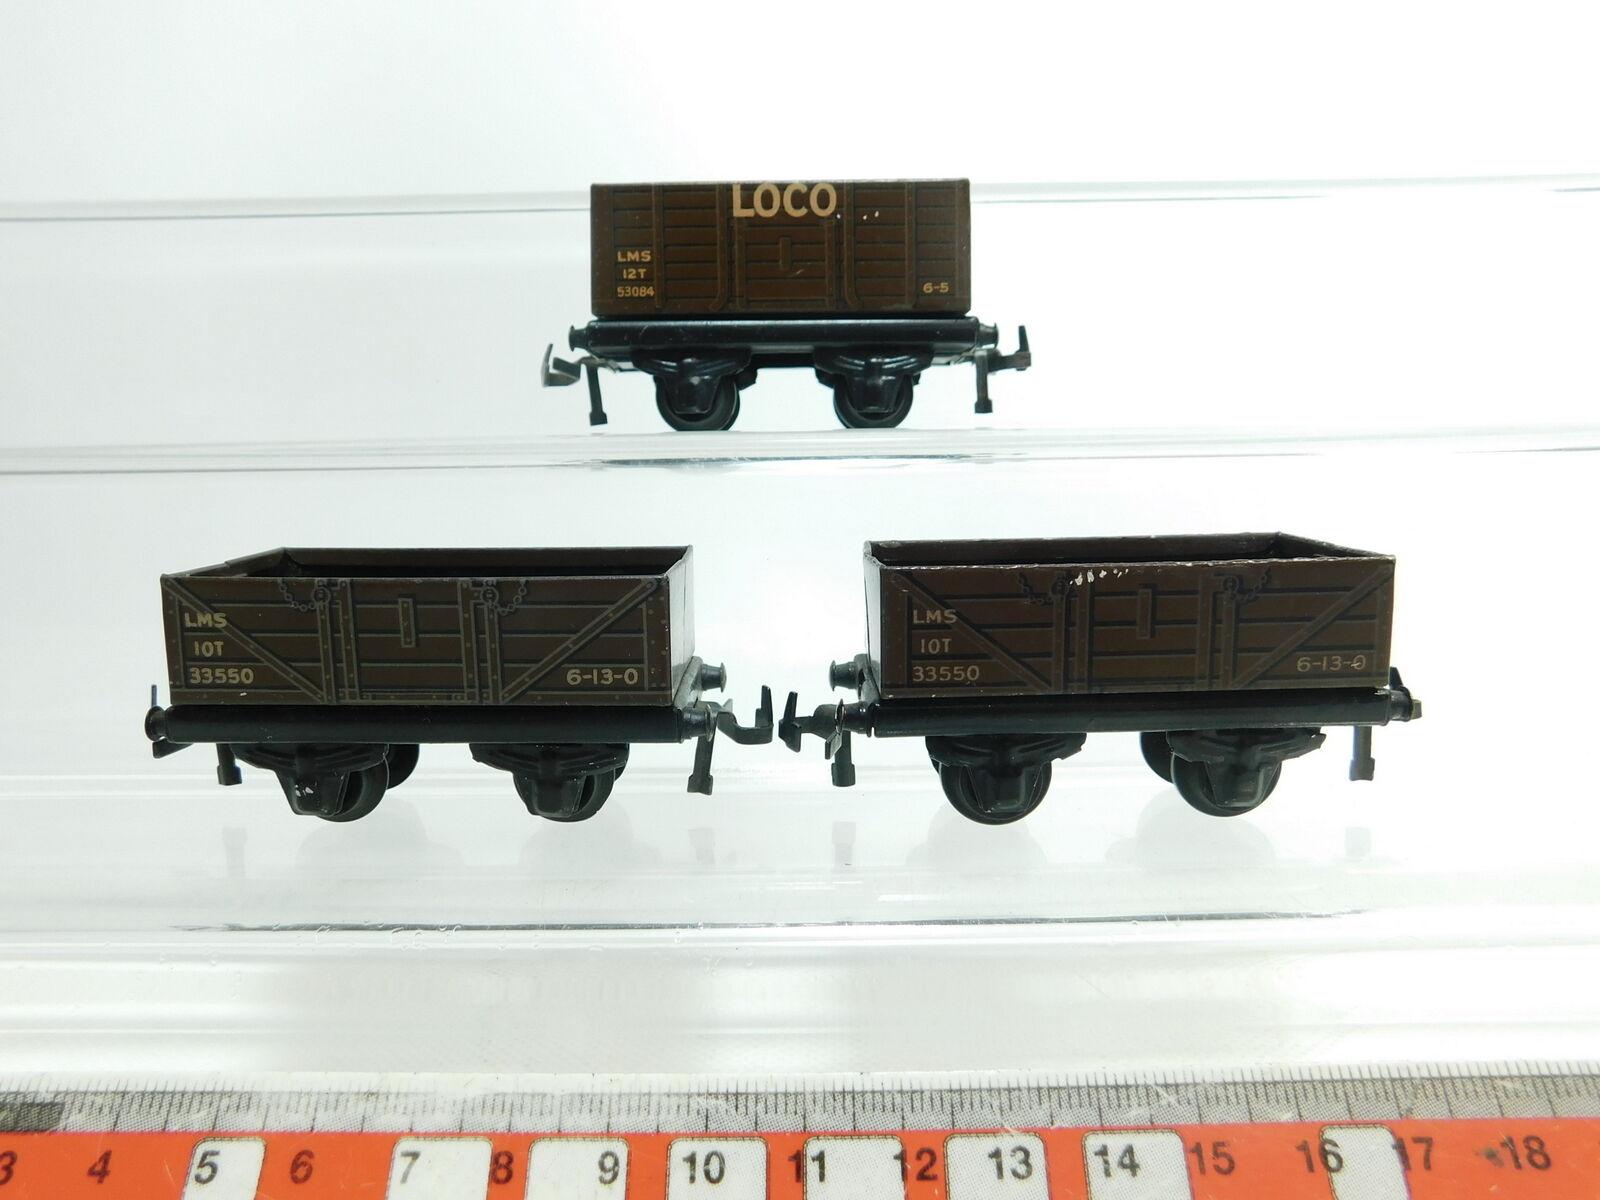 Bi629-0, 5  3x TTR TRIX TWIN RAILWAYS h0 dc Plate-Freight Cars  33550 + 53084 LOCO